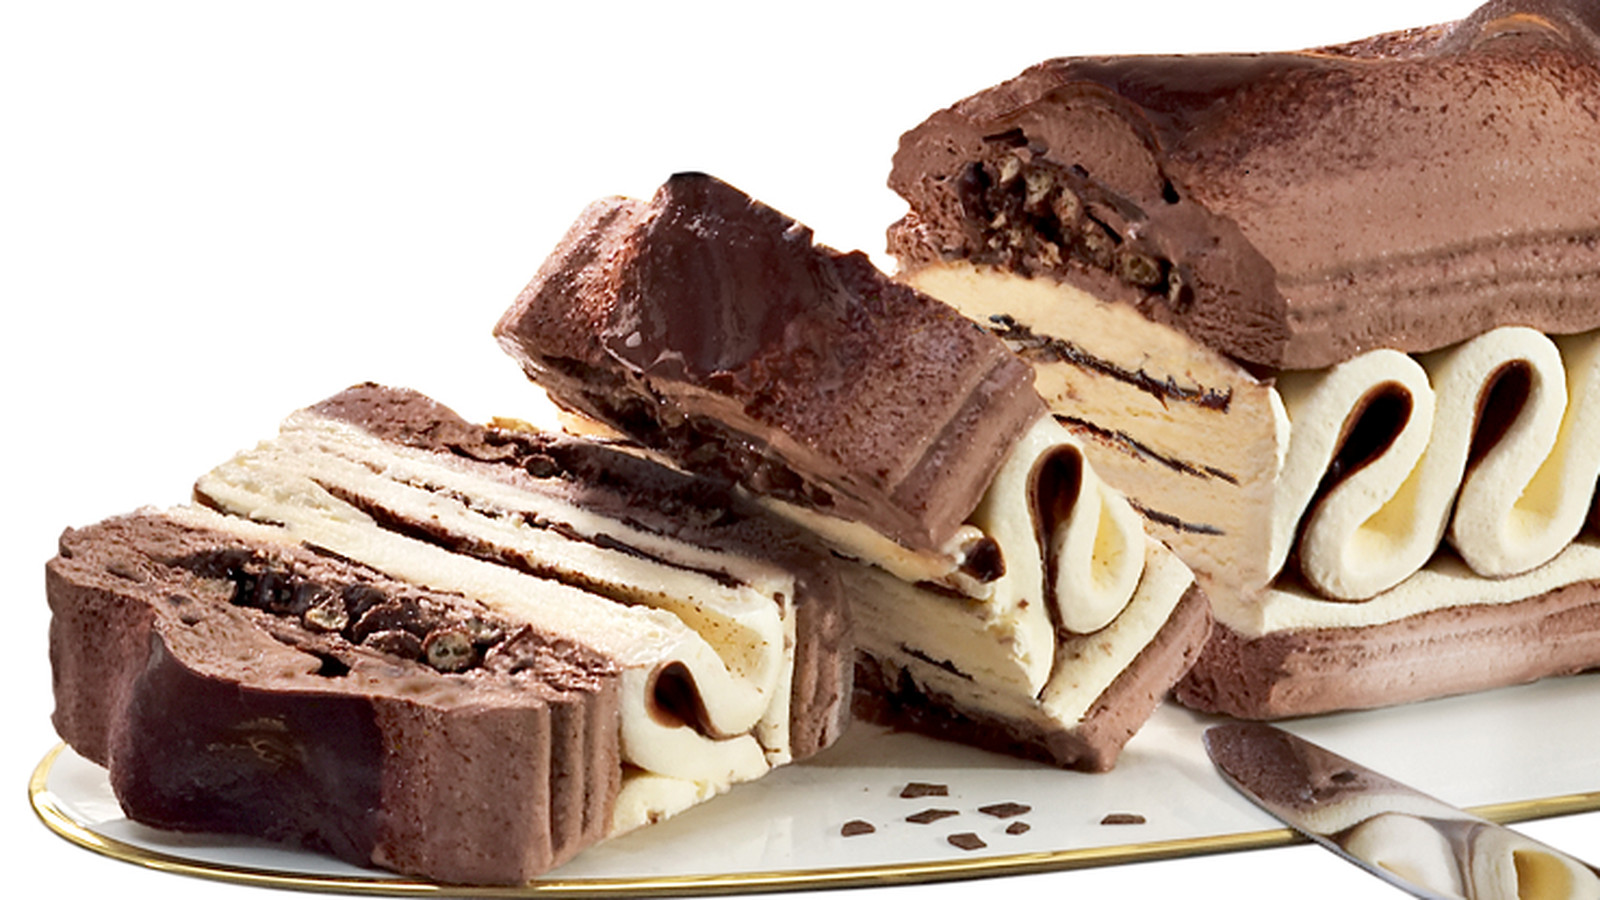 viennetta-ice-cream-cake.0.0.png